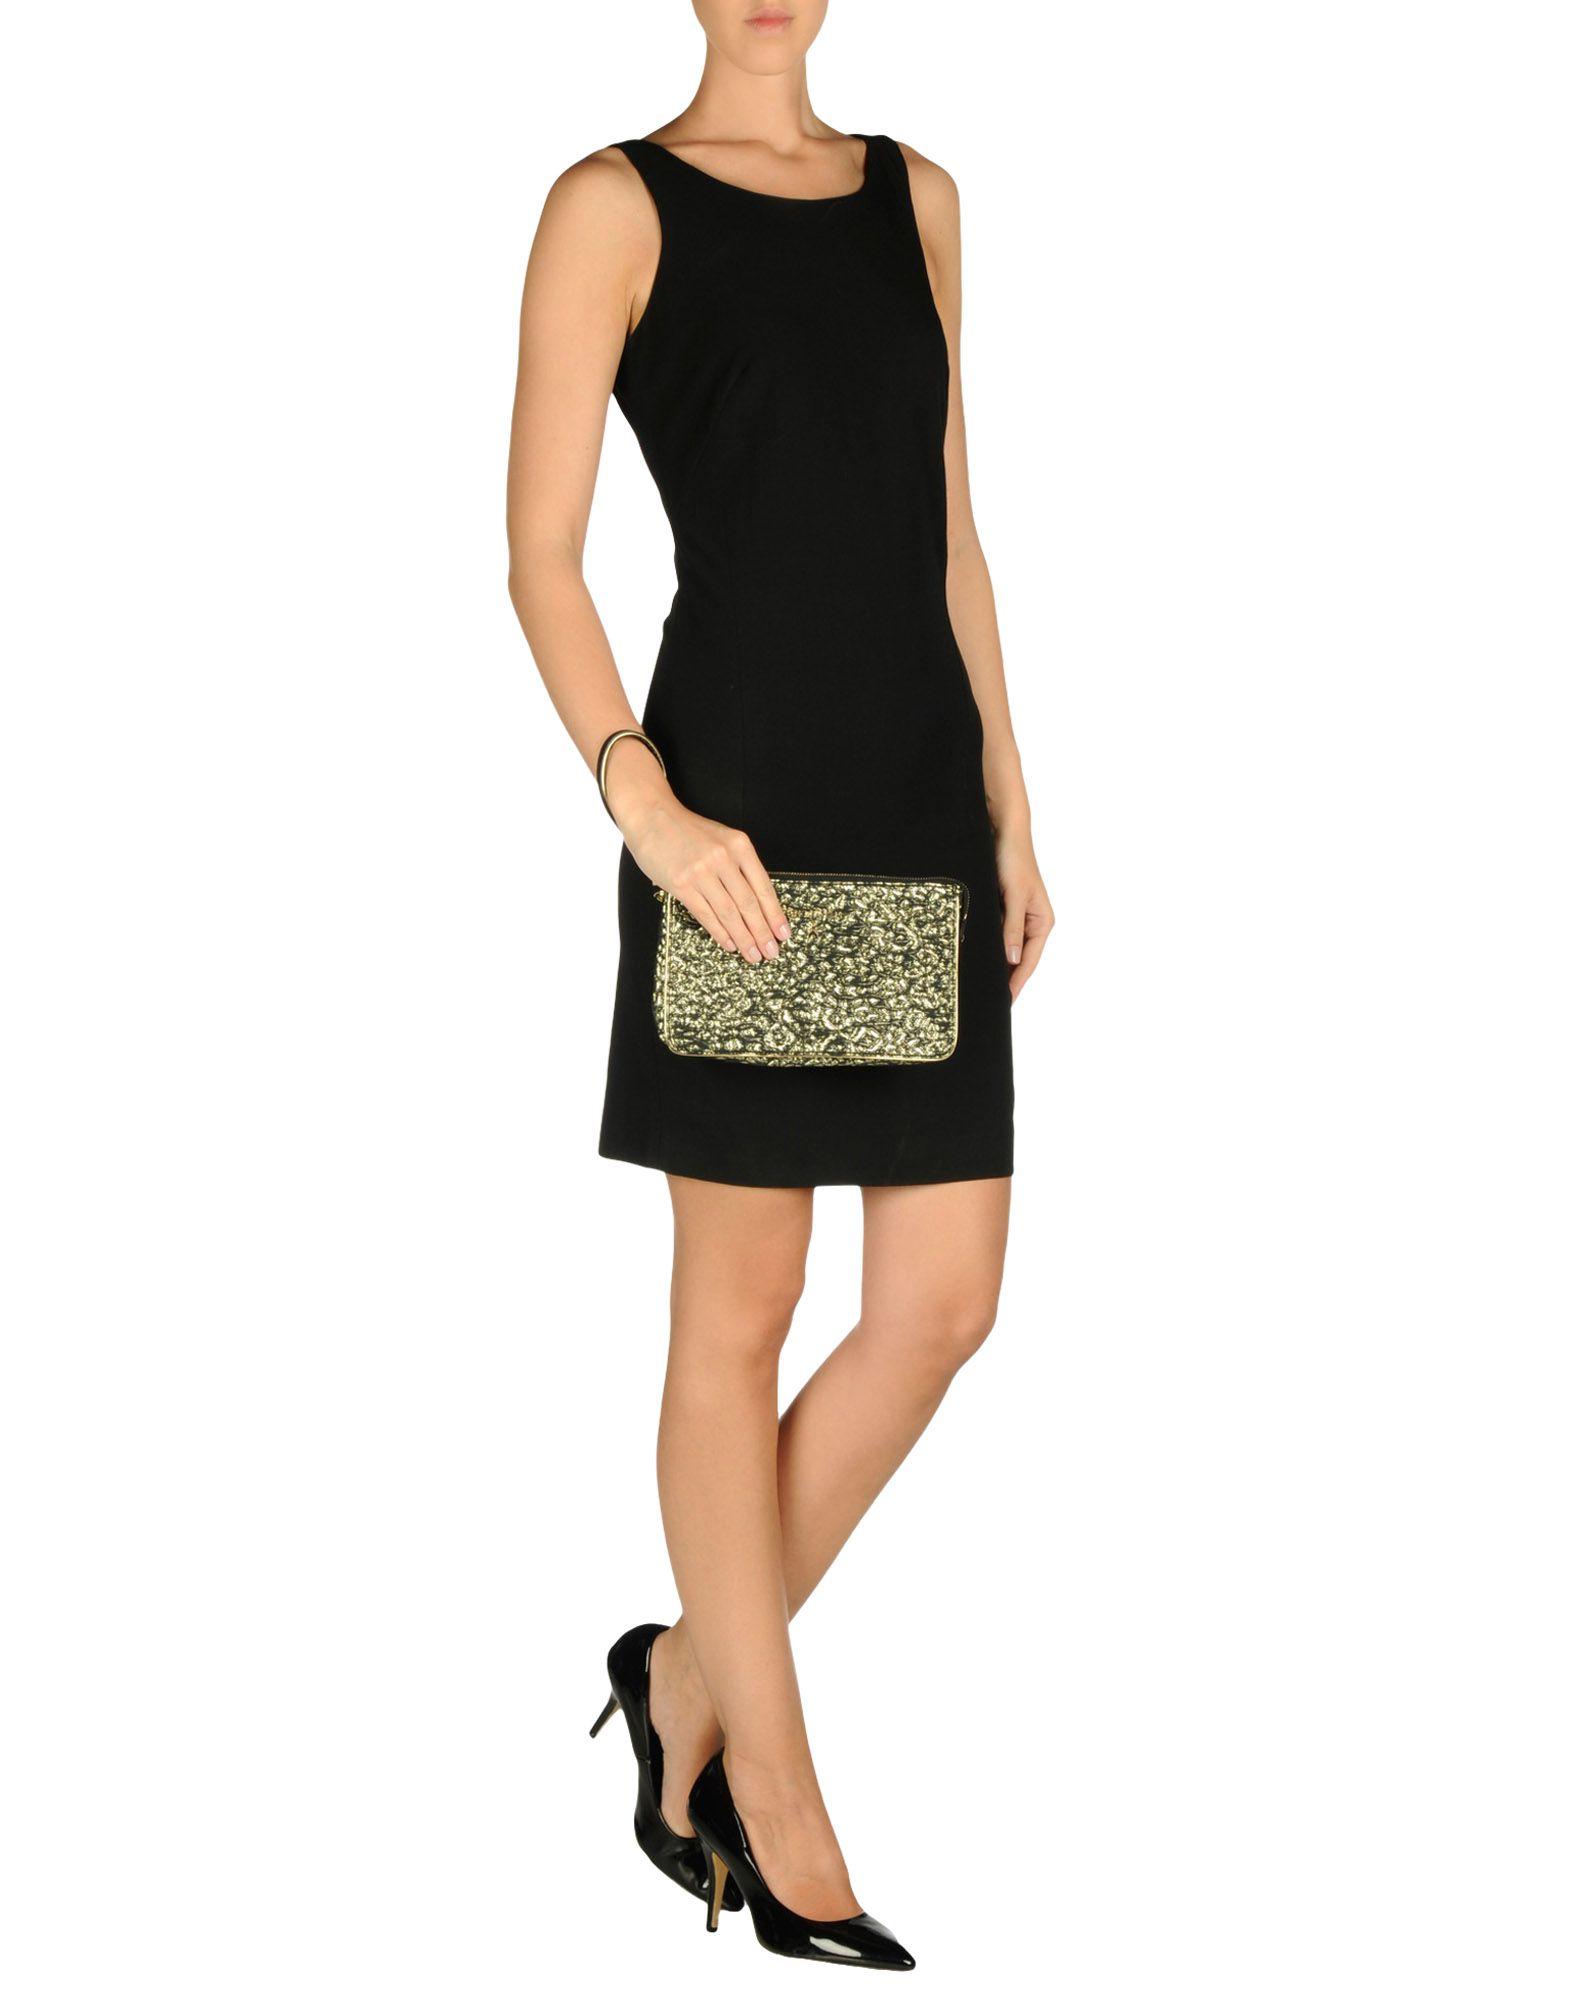 patrizia pepe handbag in black lyst. Black Bedroom Furniture Sets. Home Design Ideas